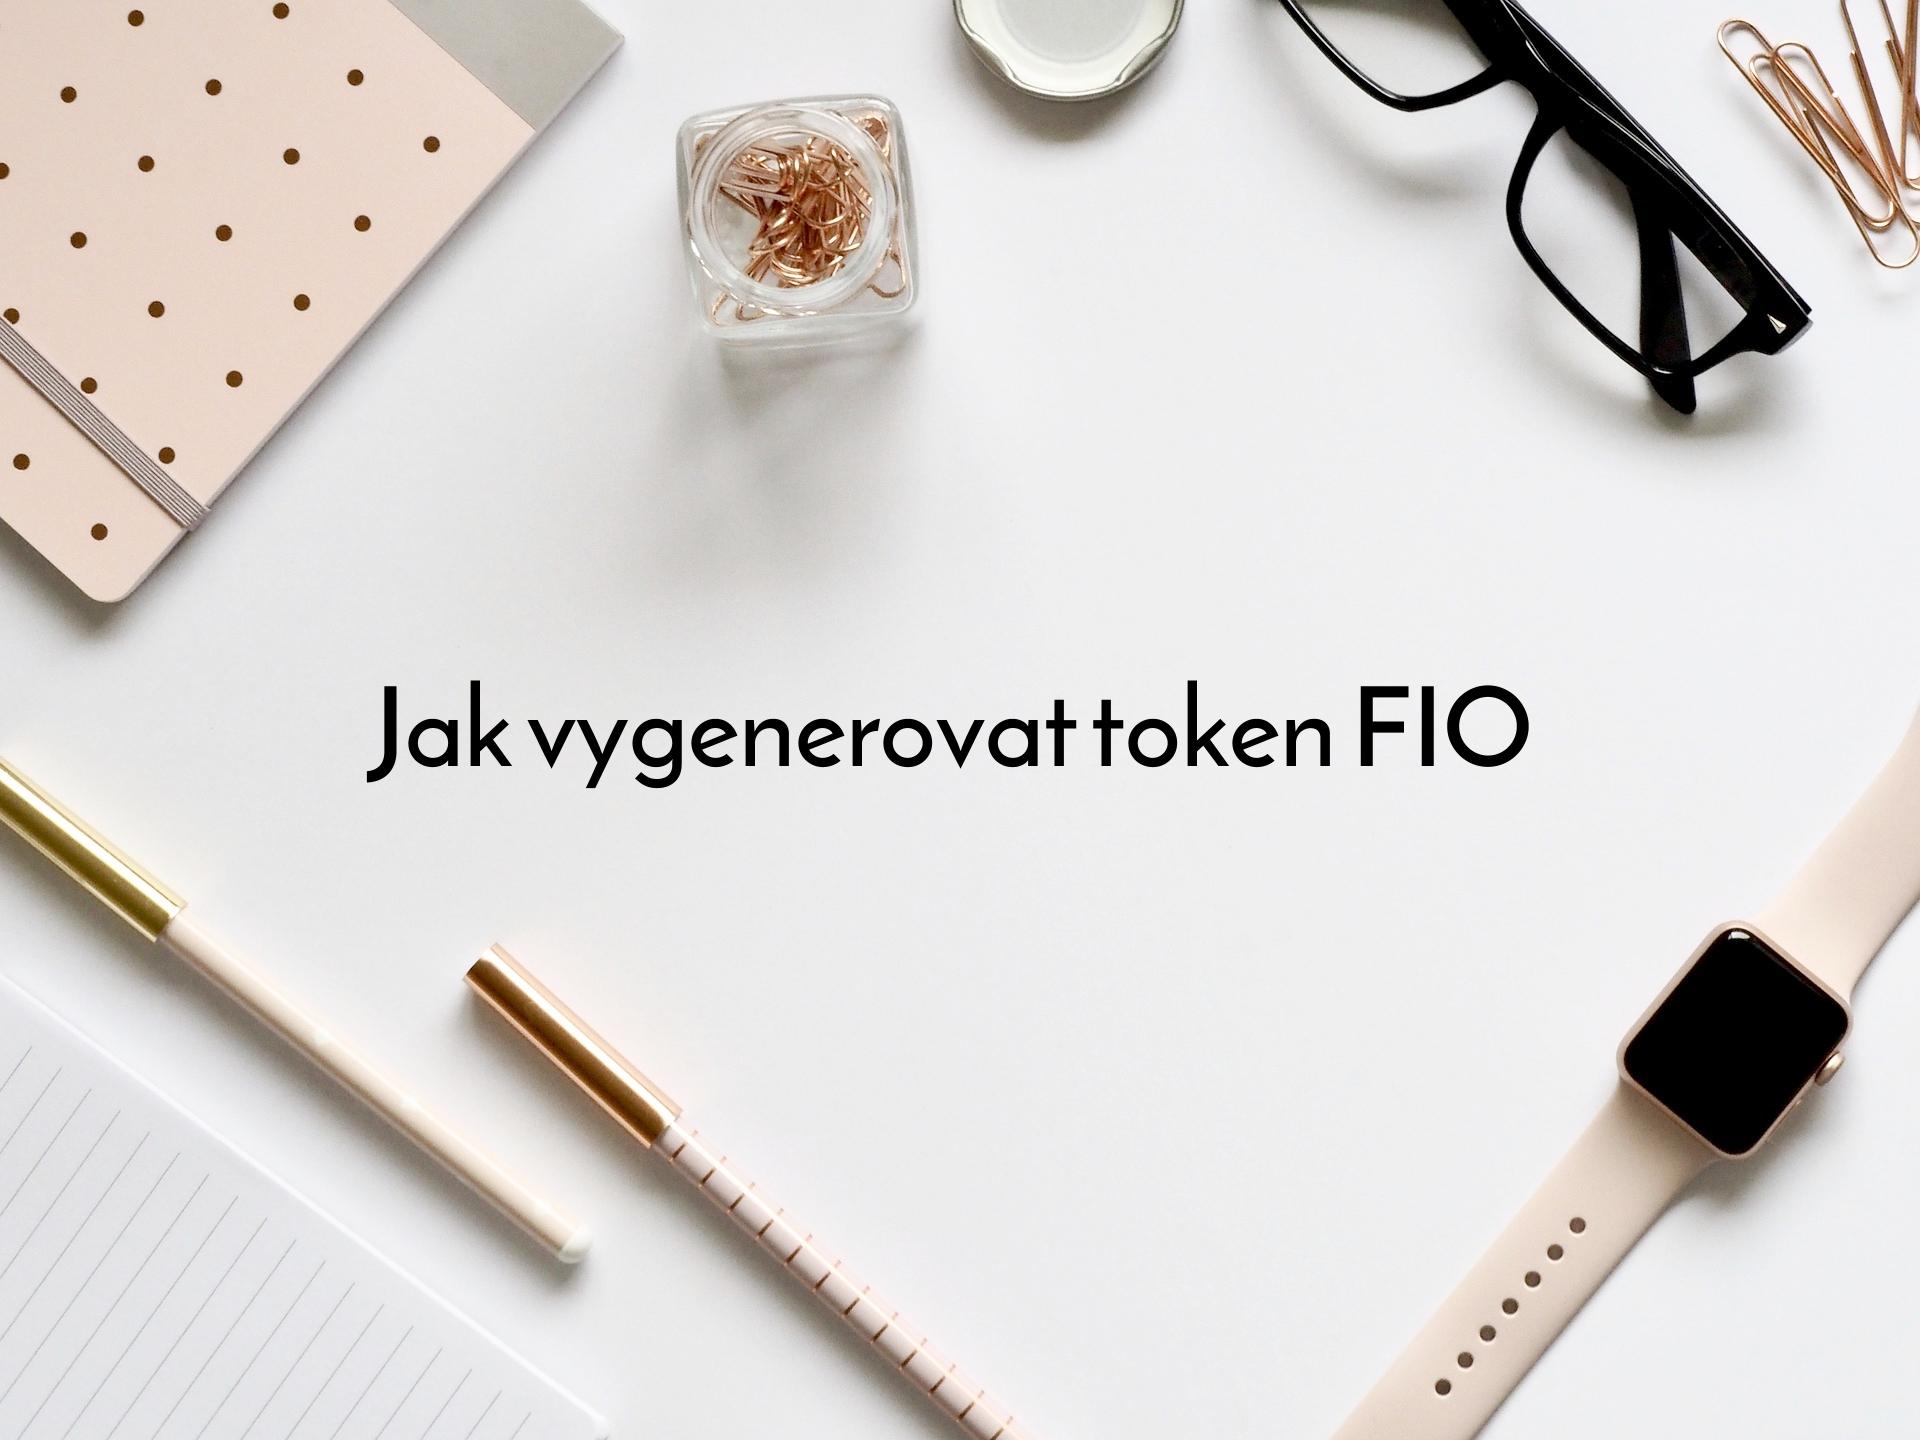 Jak vygenerovat token FIO